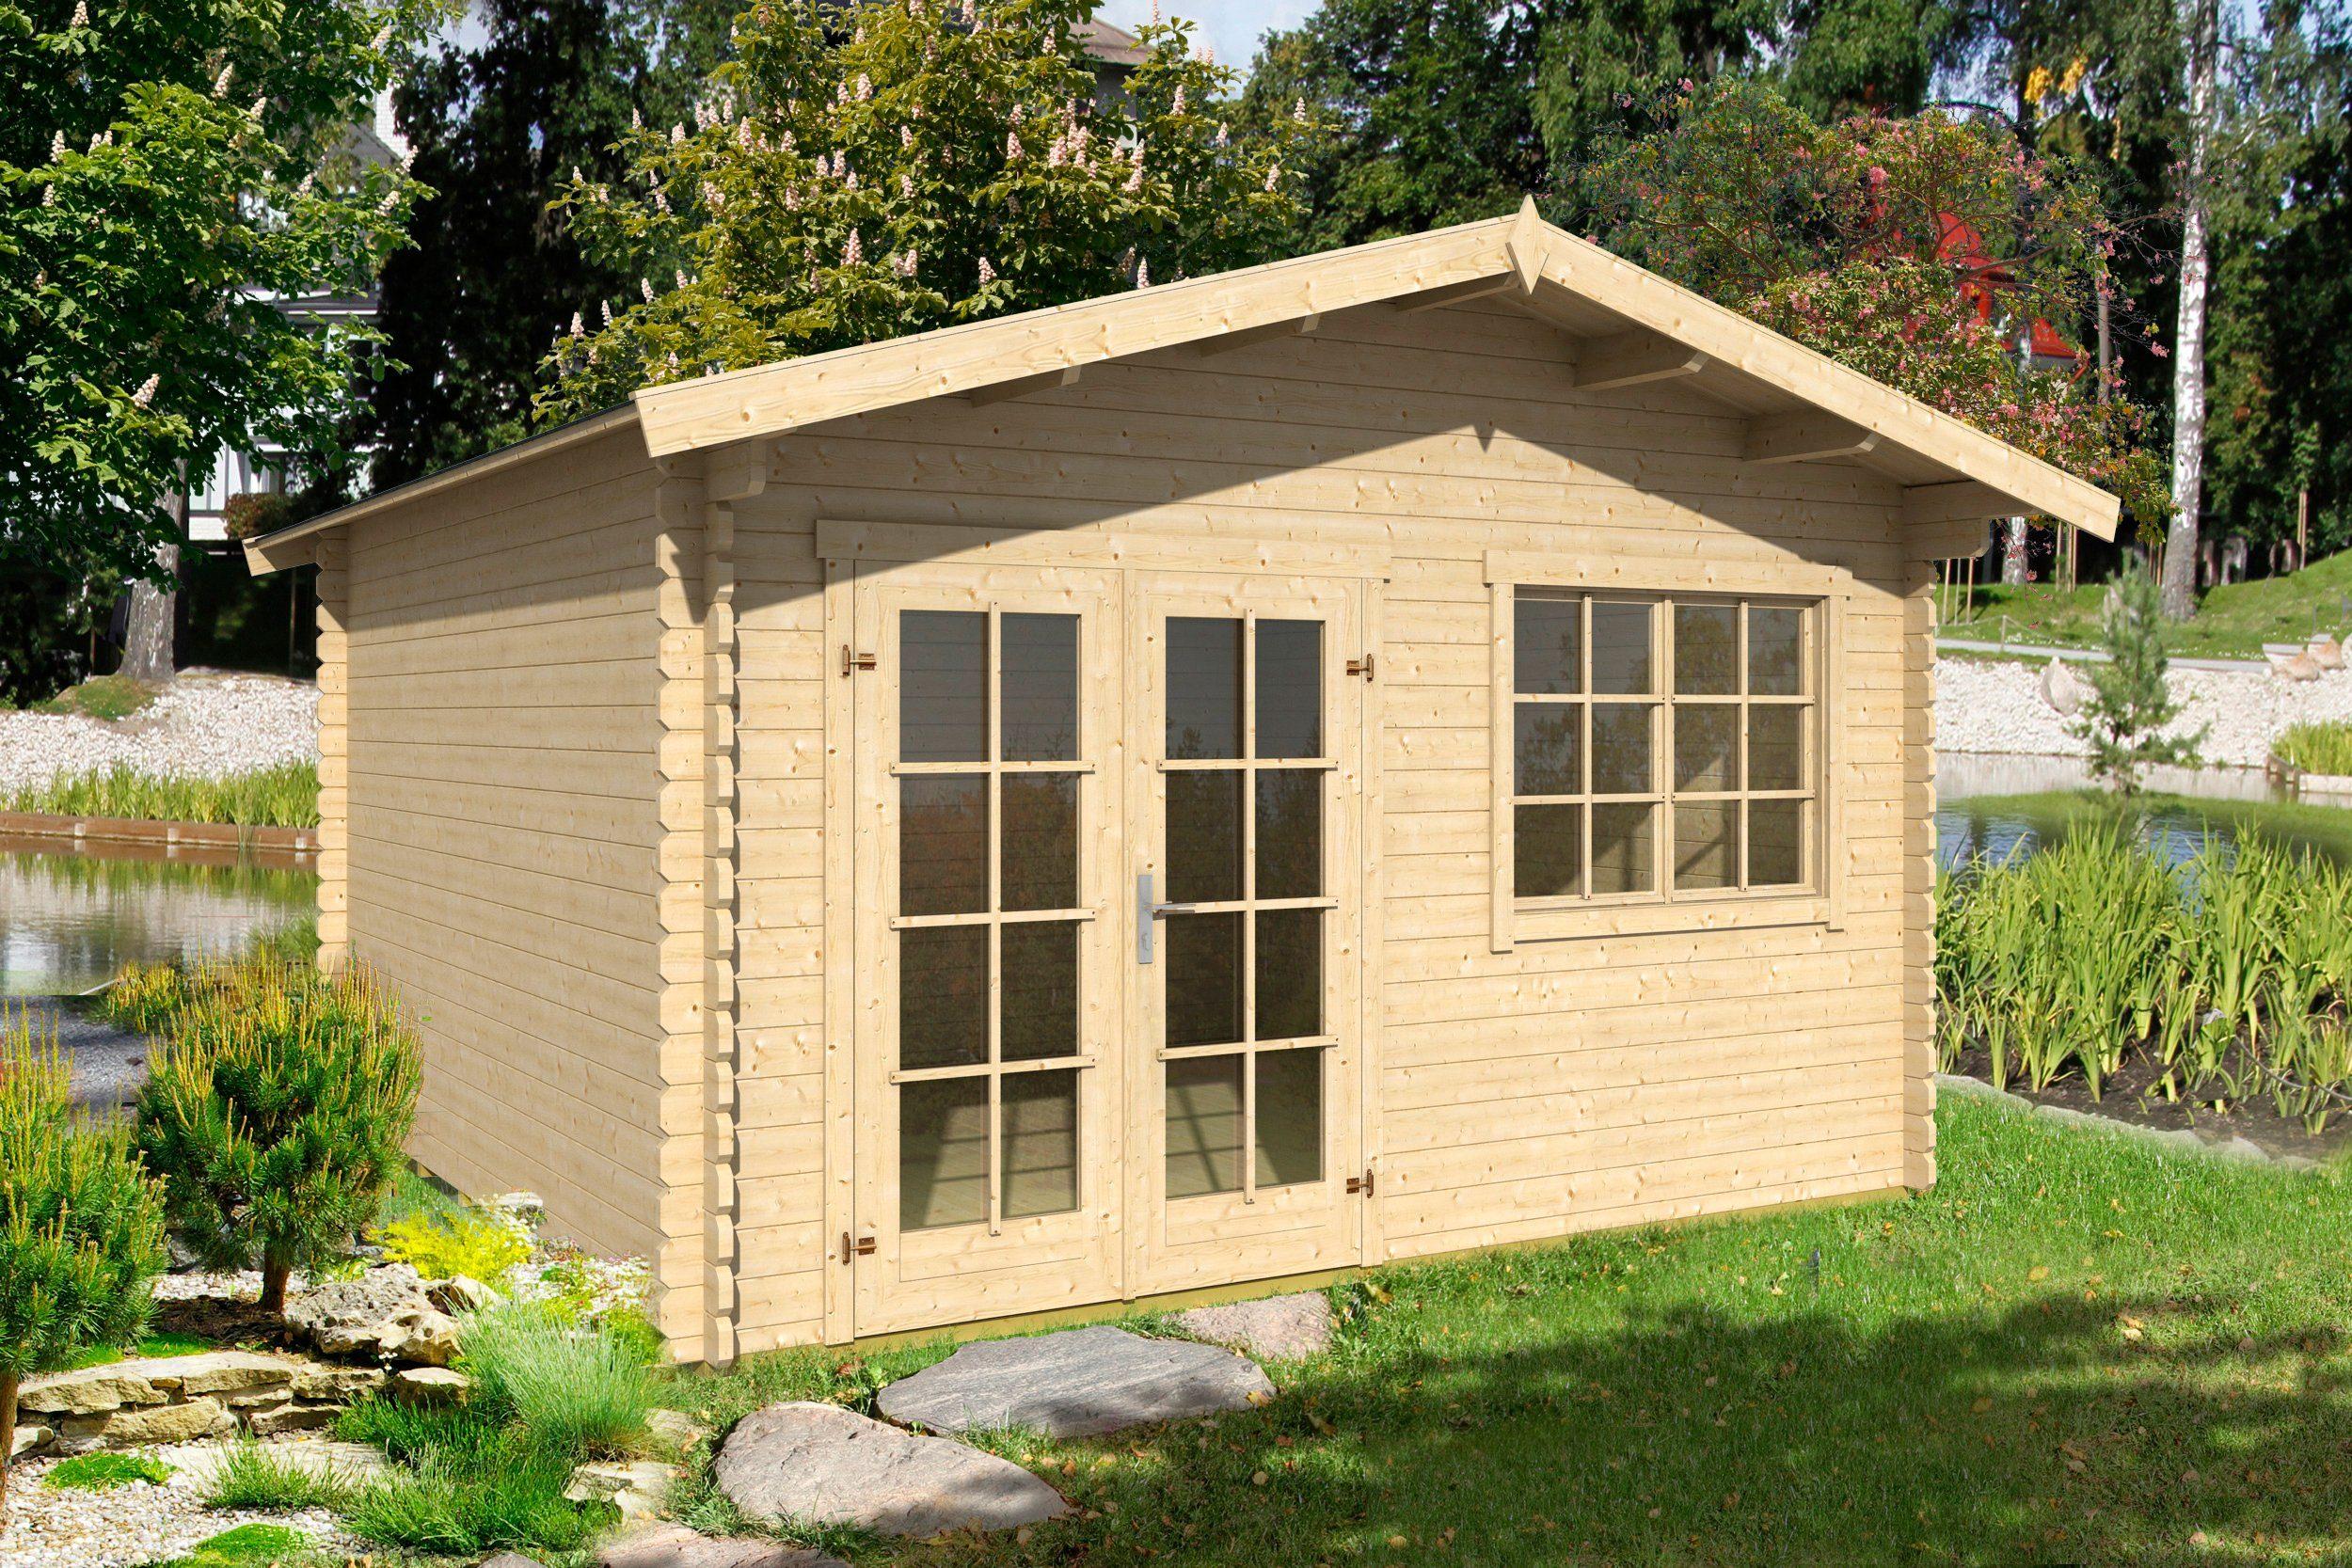 Gartenhaus Fußboden Notwendig ~ Boden für obi gartenhaus kompakt d kaufen bei obi